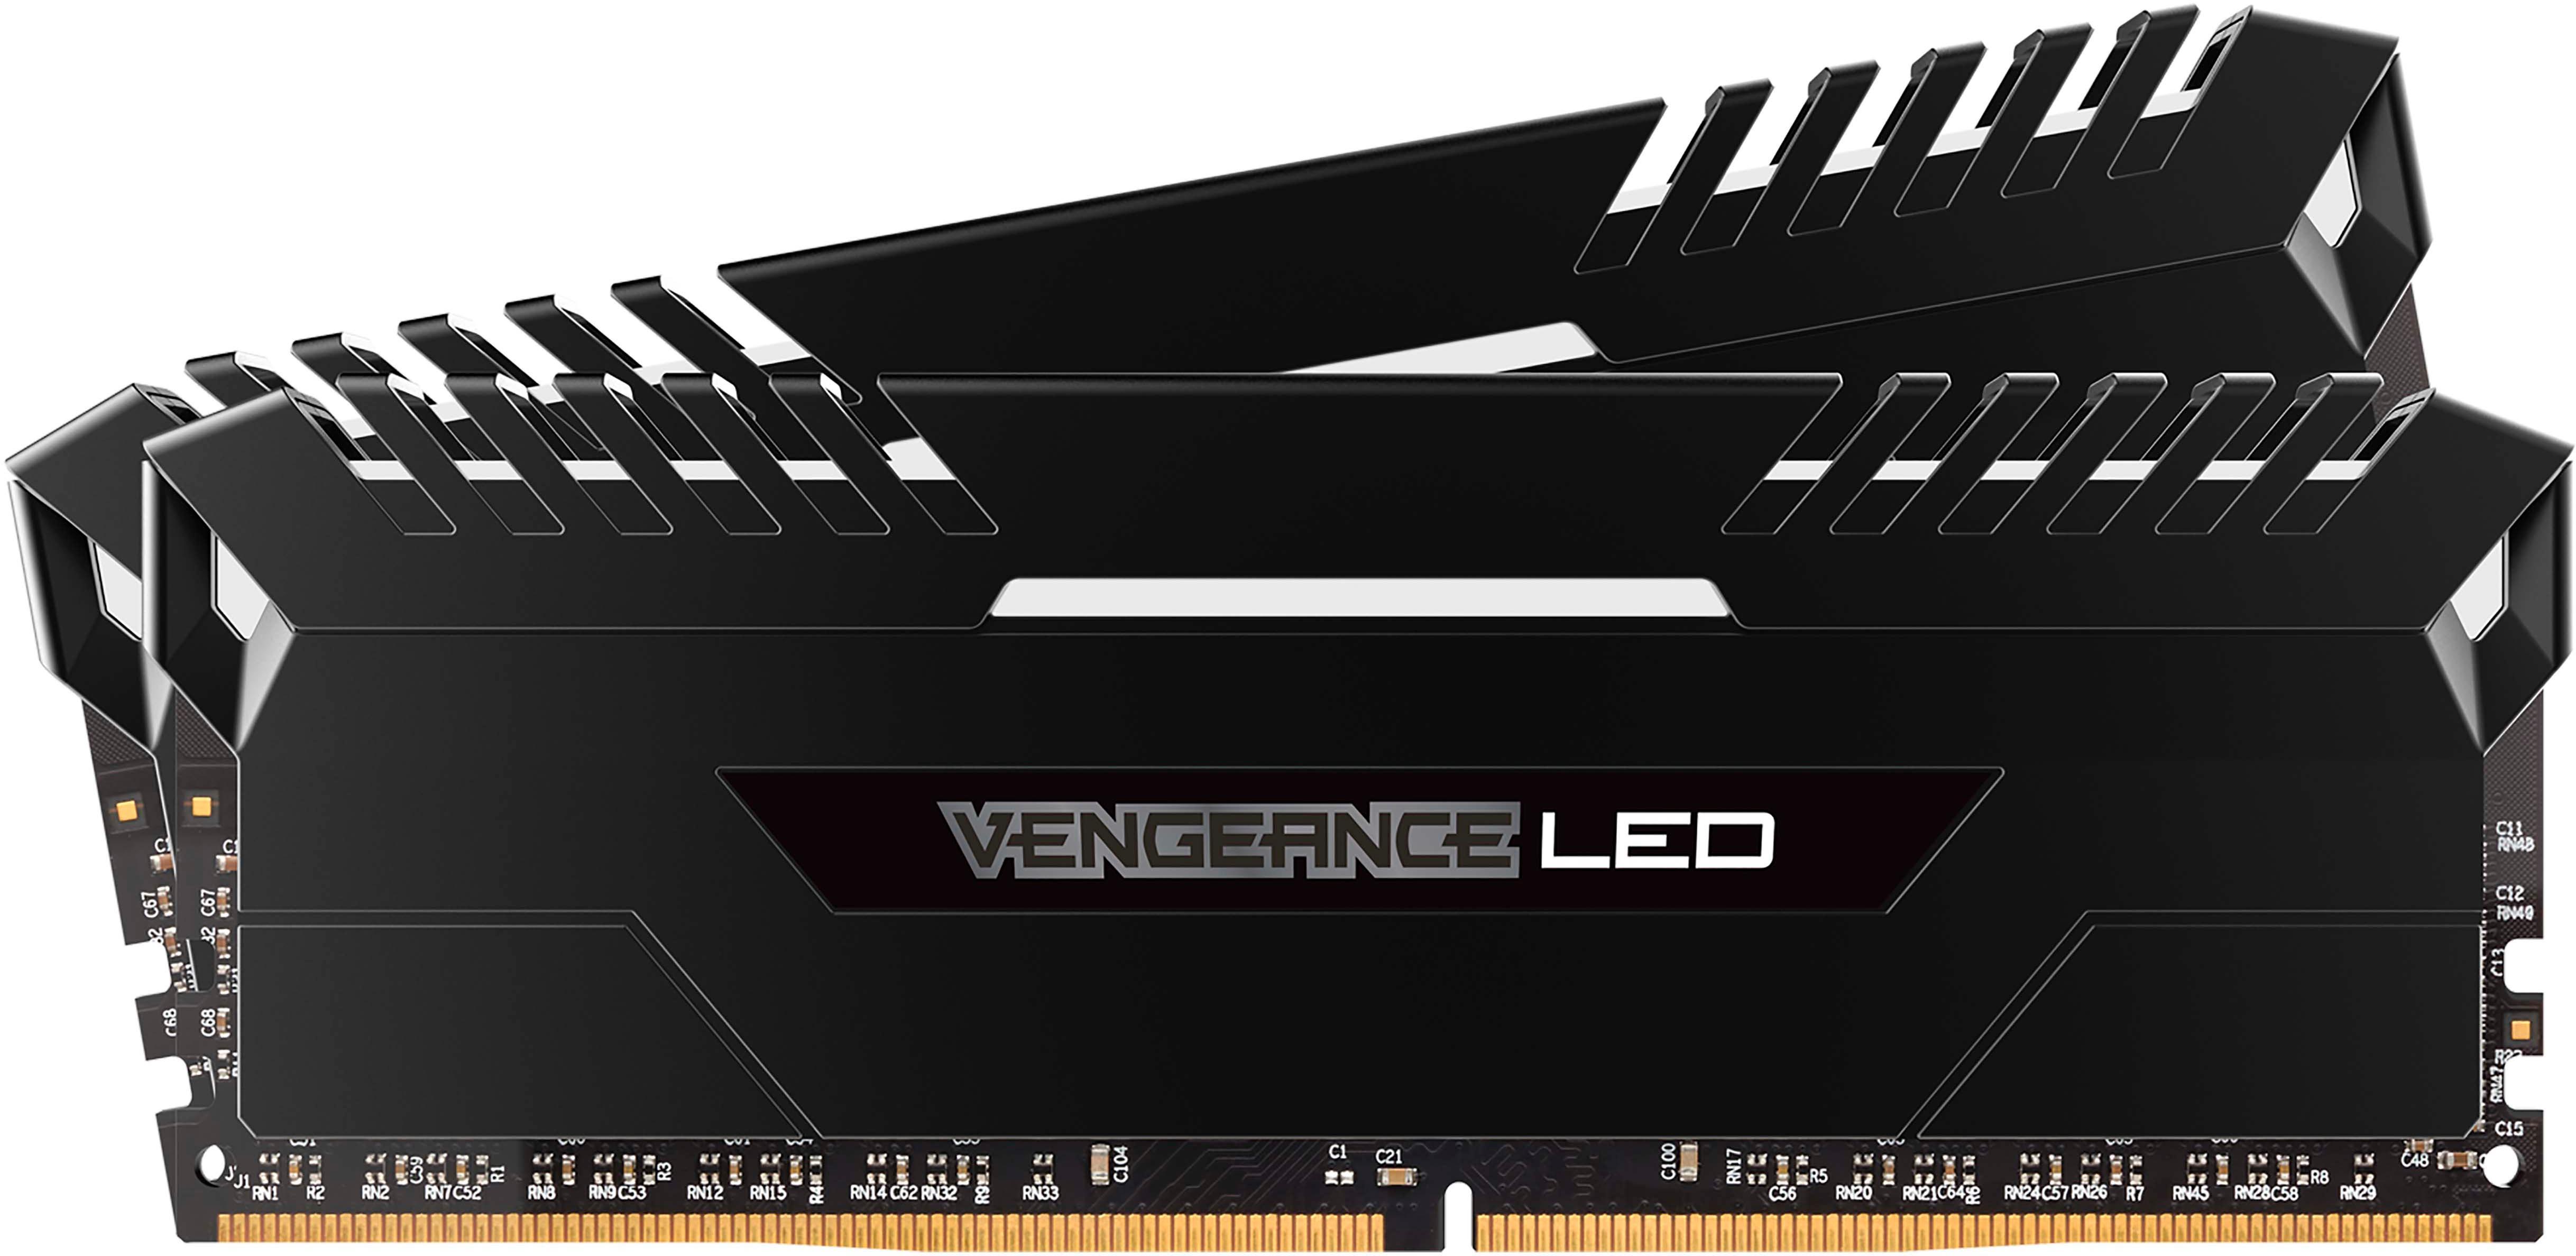 CORSAIR VENGEANCE LED Series 32GB (2PK 16GB) 3.0GHz DDR4 Desktop Memory with LED Lighting Black CMU32GX4M2C3000C15